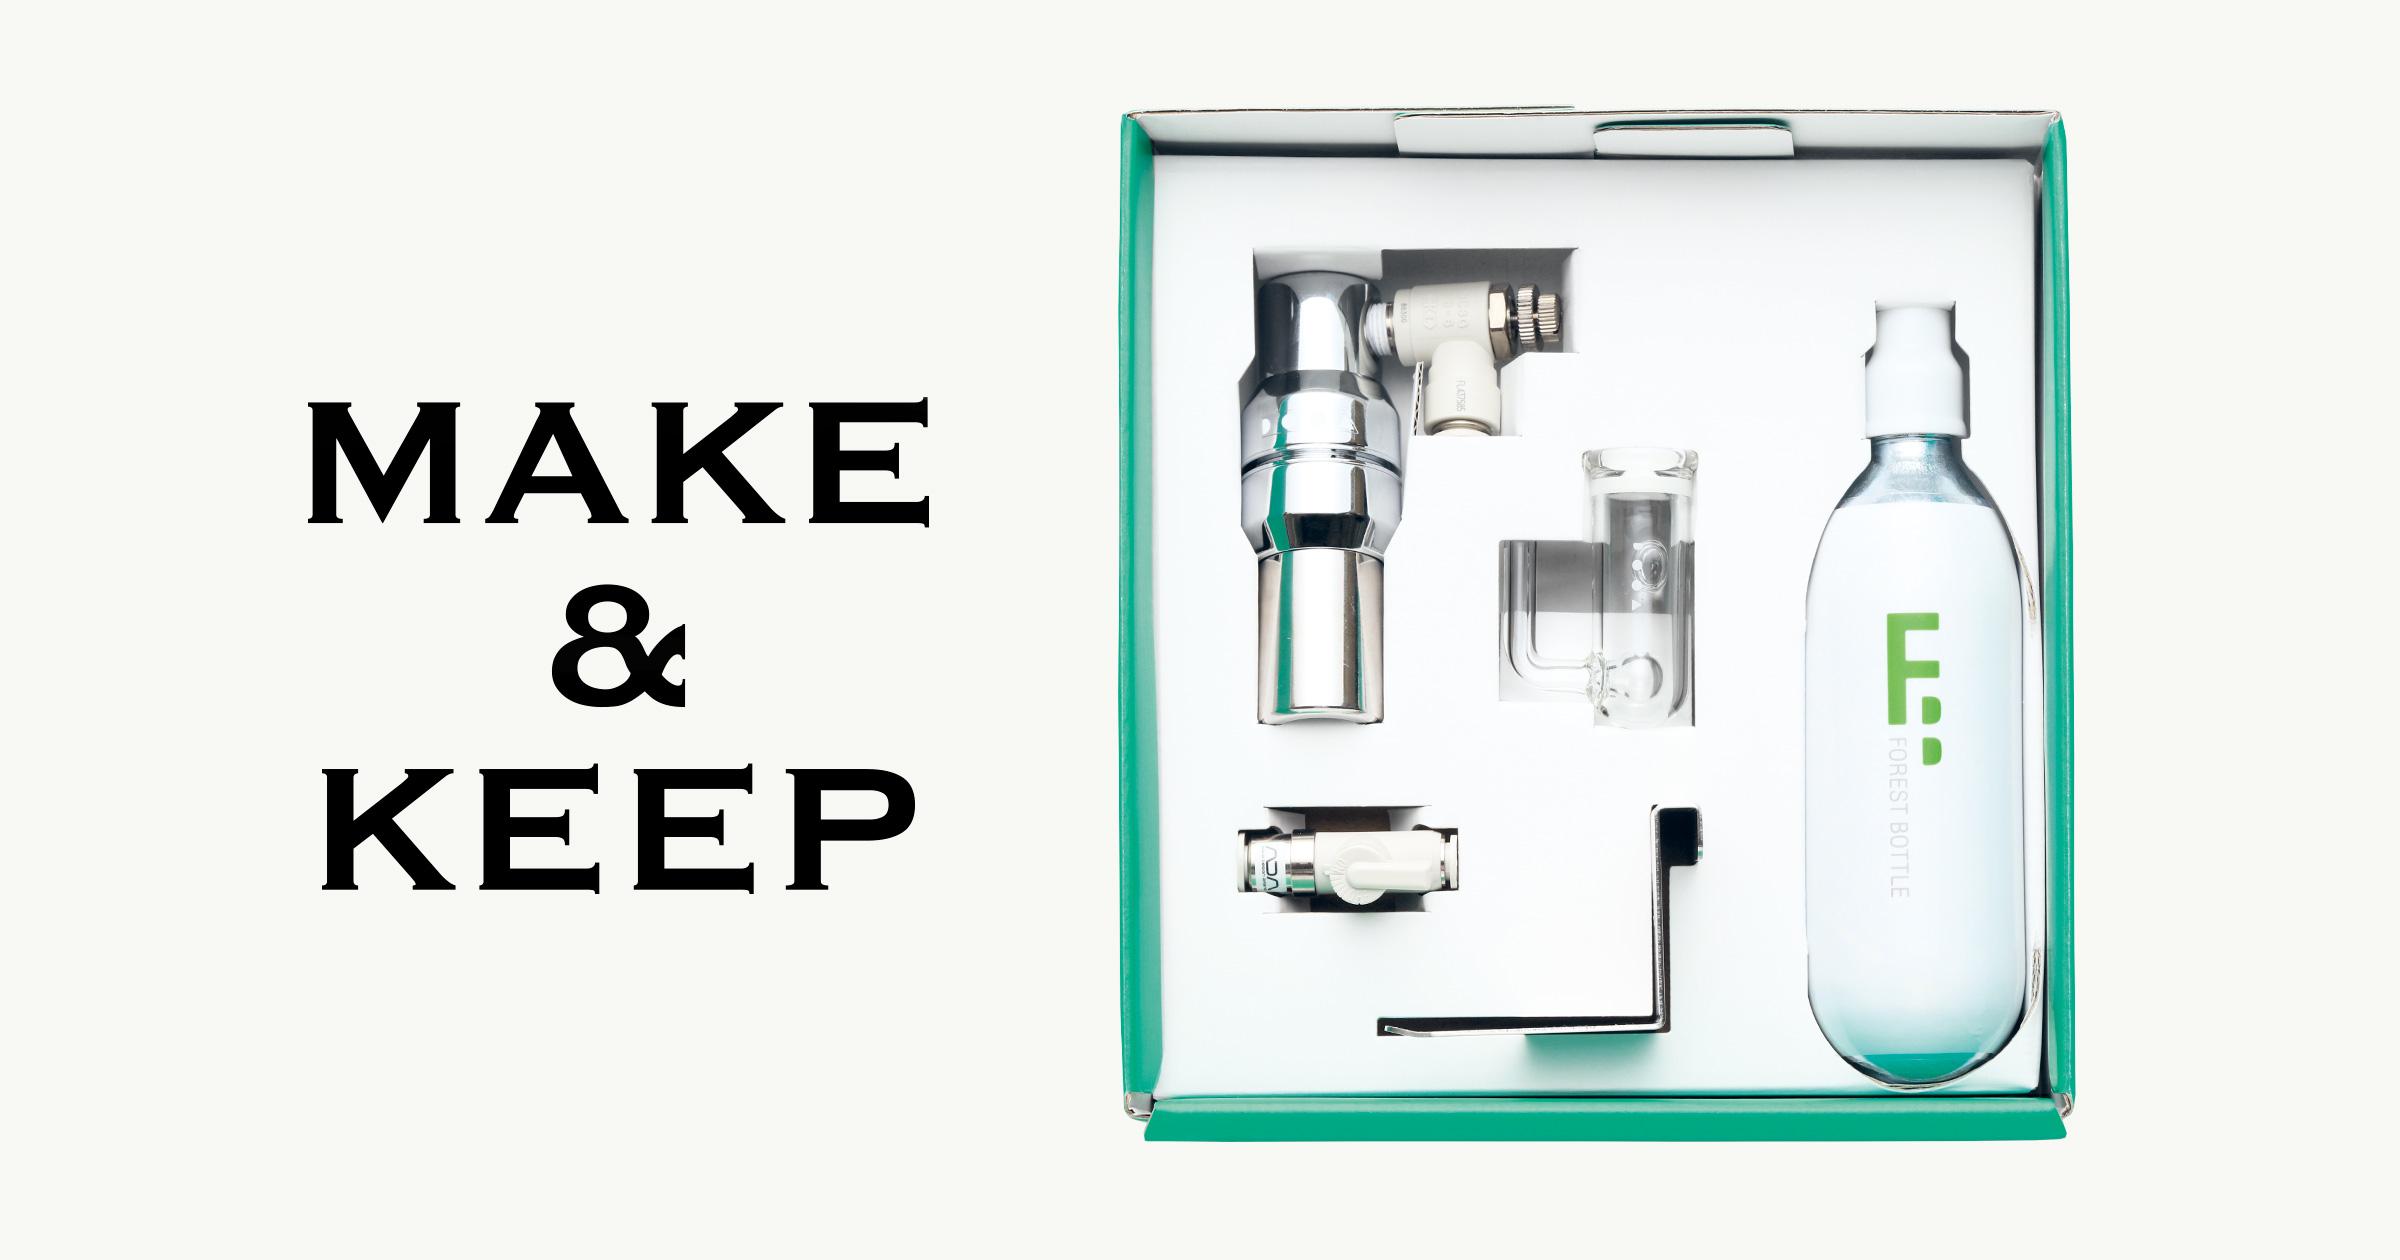 MAKE & KEEP 'CO₂ SYSTEM KIT'